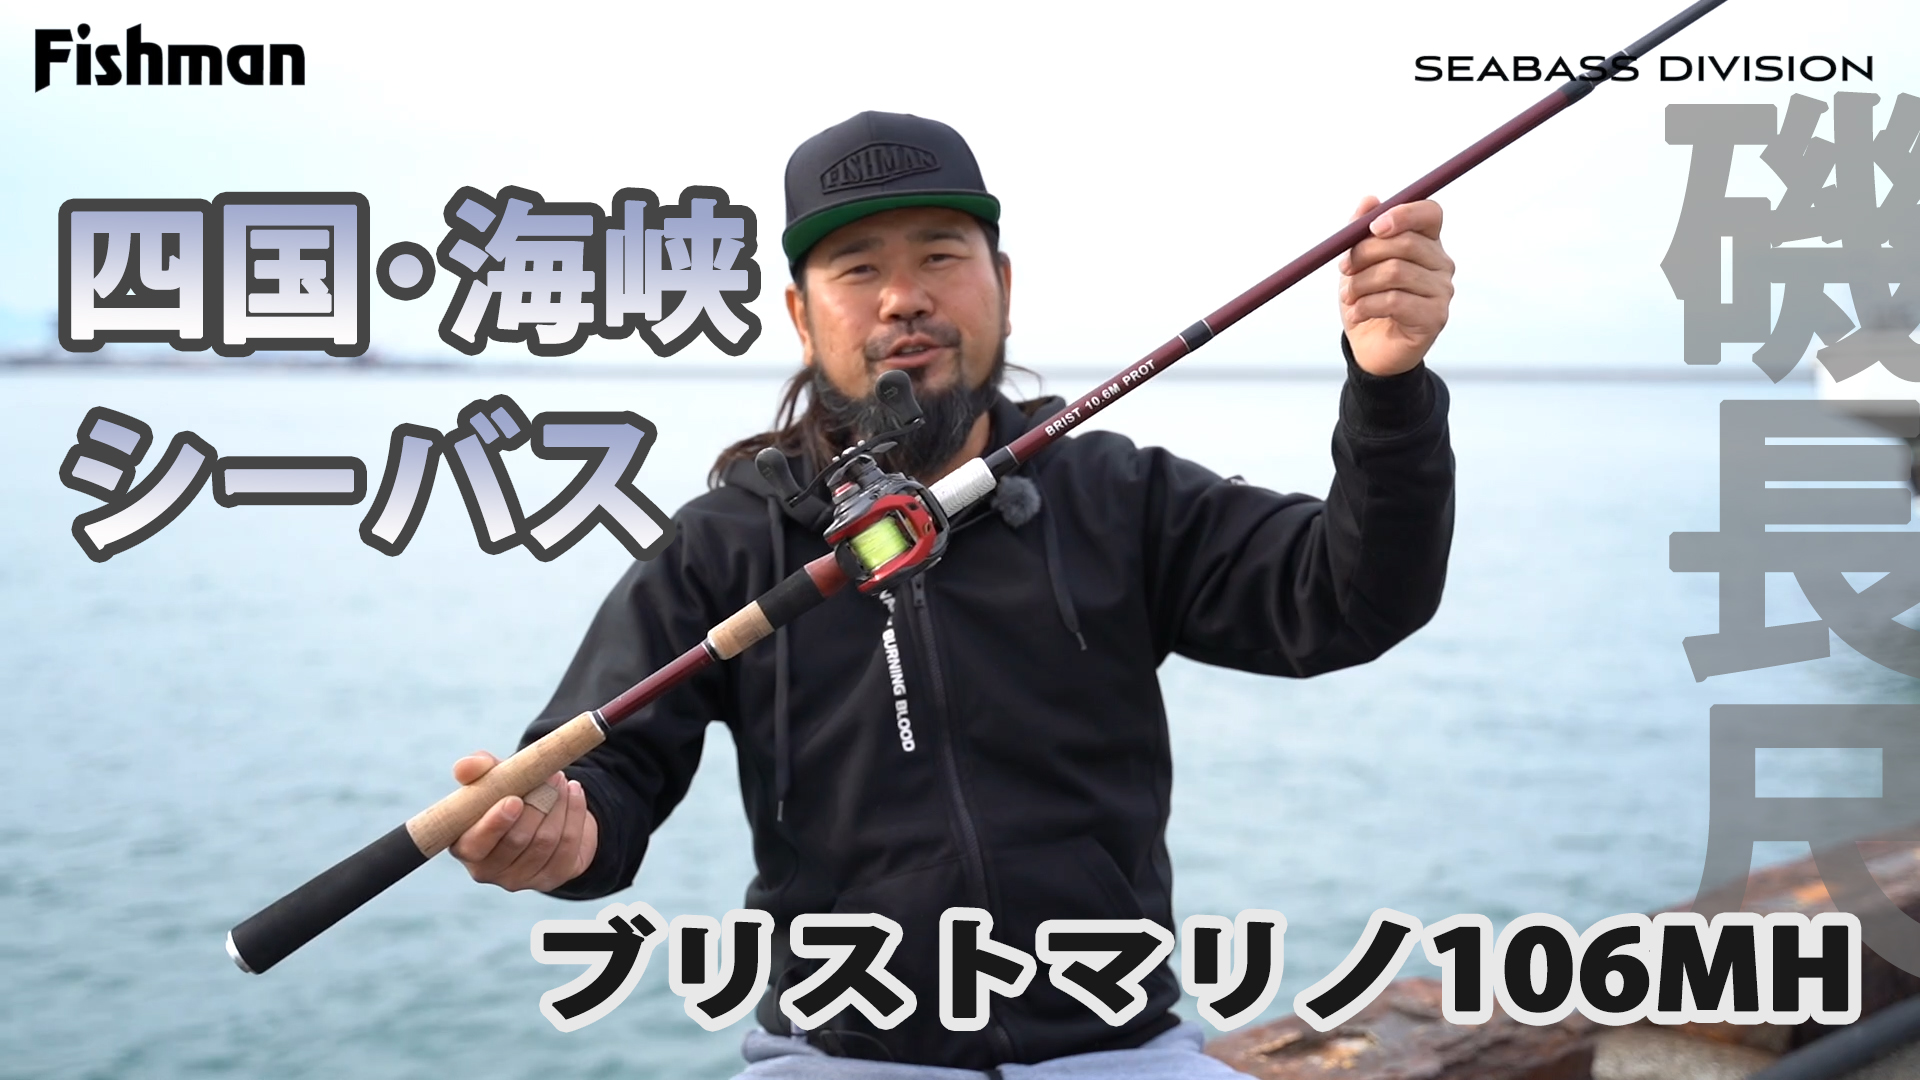 Fishman TVseabass division3 冬の四国・海峡シーバスフィッシングをアップしました!